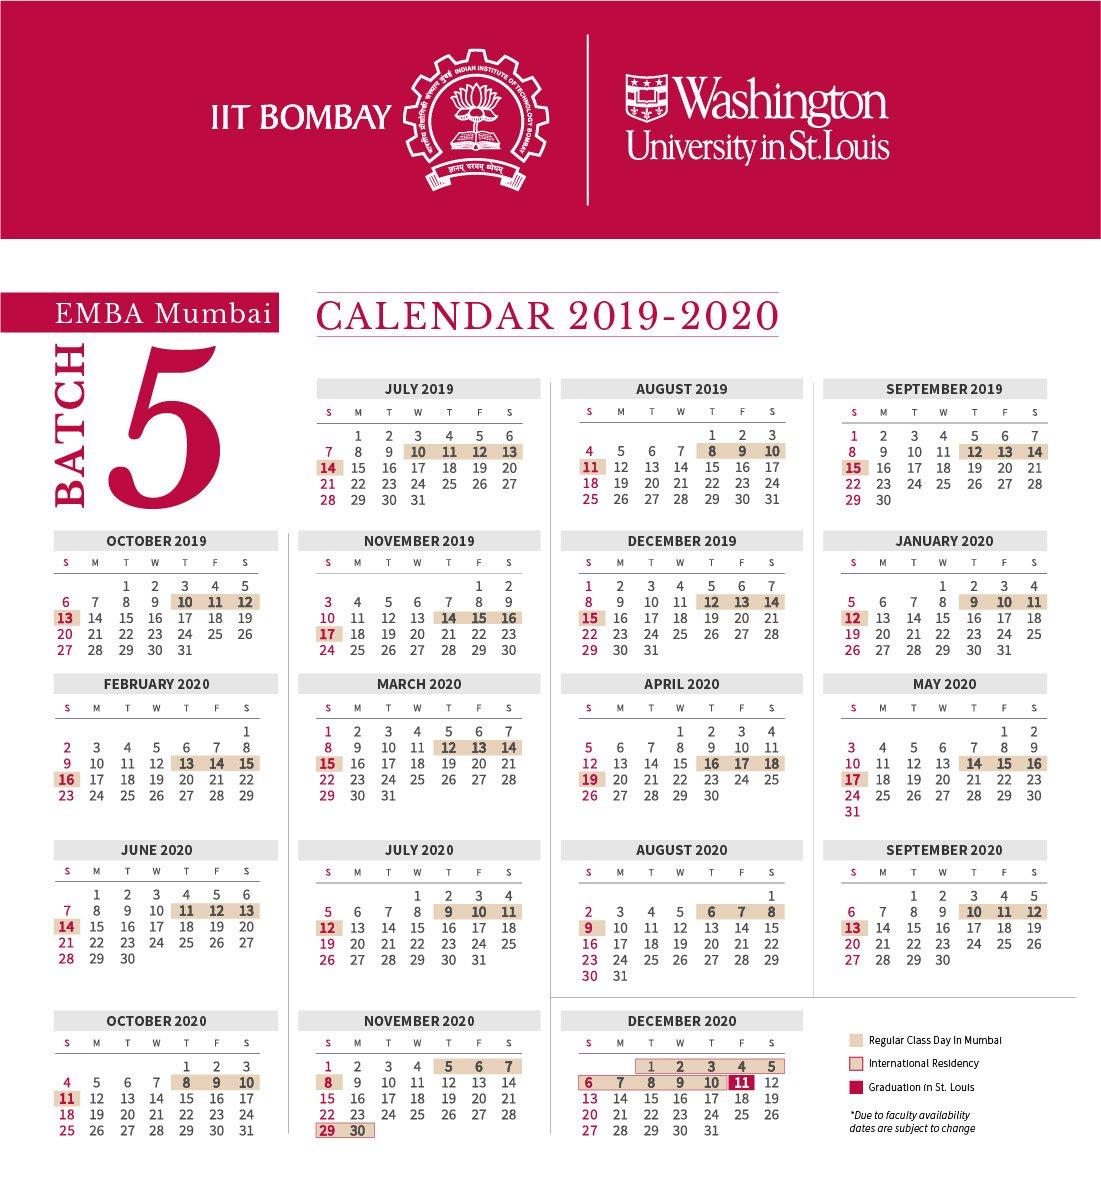 Washu Calendar - Bgadv Washu Calendar 2019